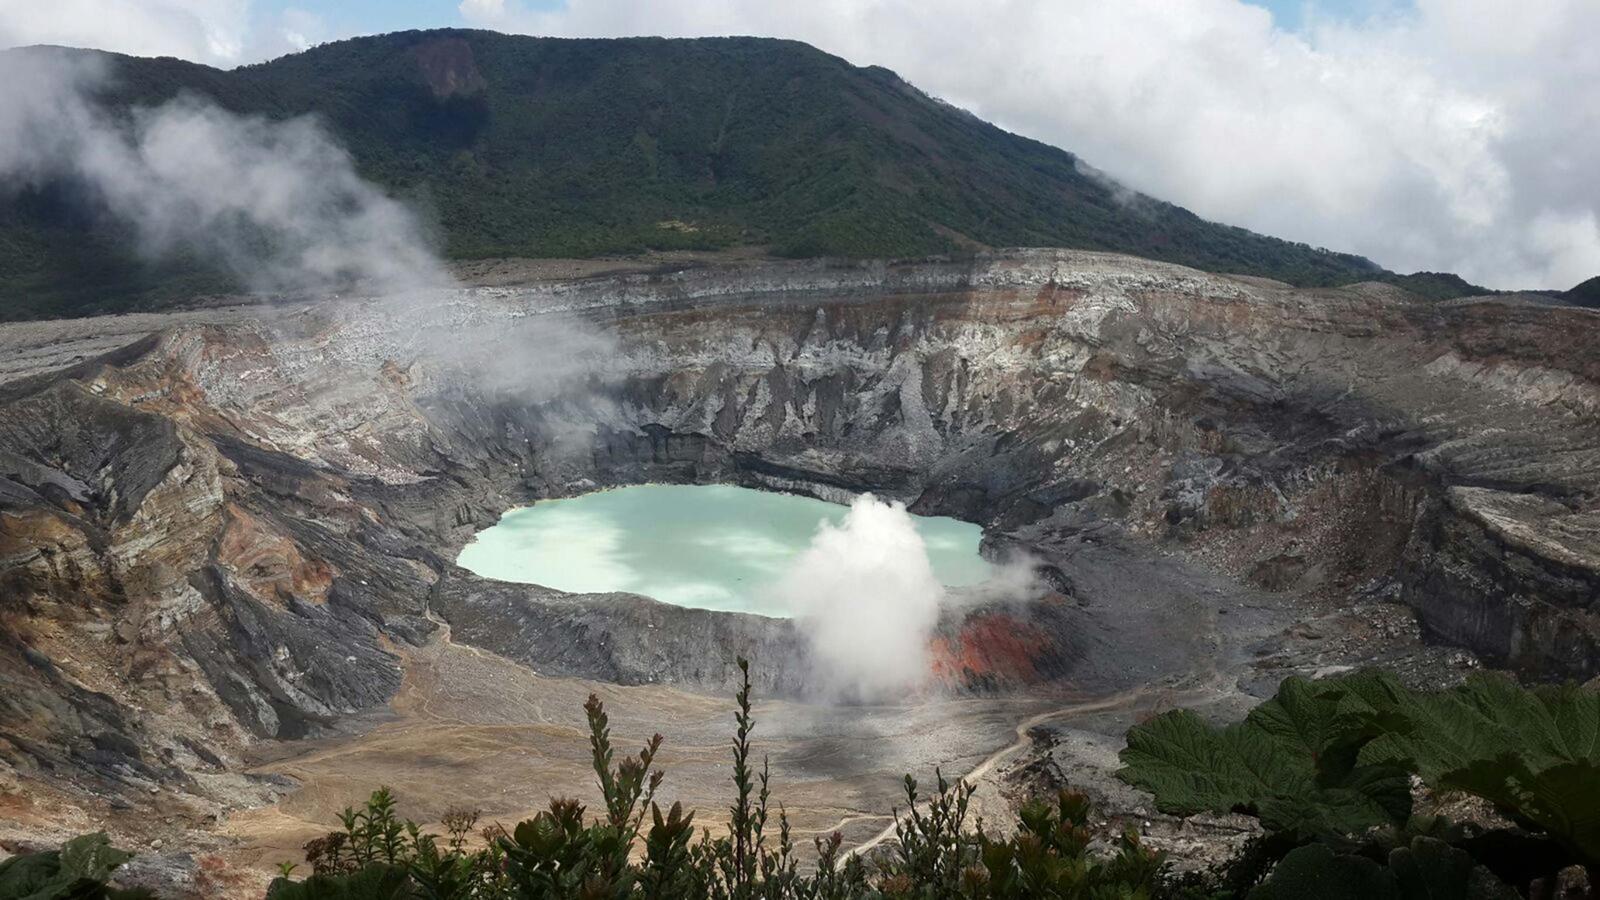 San Jose Day Tour Poas Volcano Full Day In Costa Rica Central America G Adventures